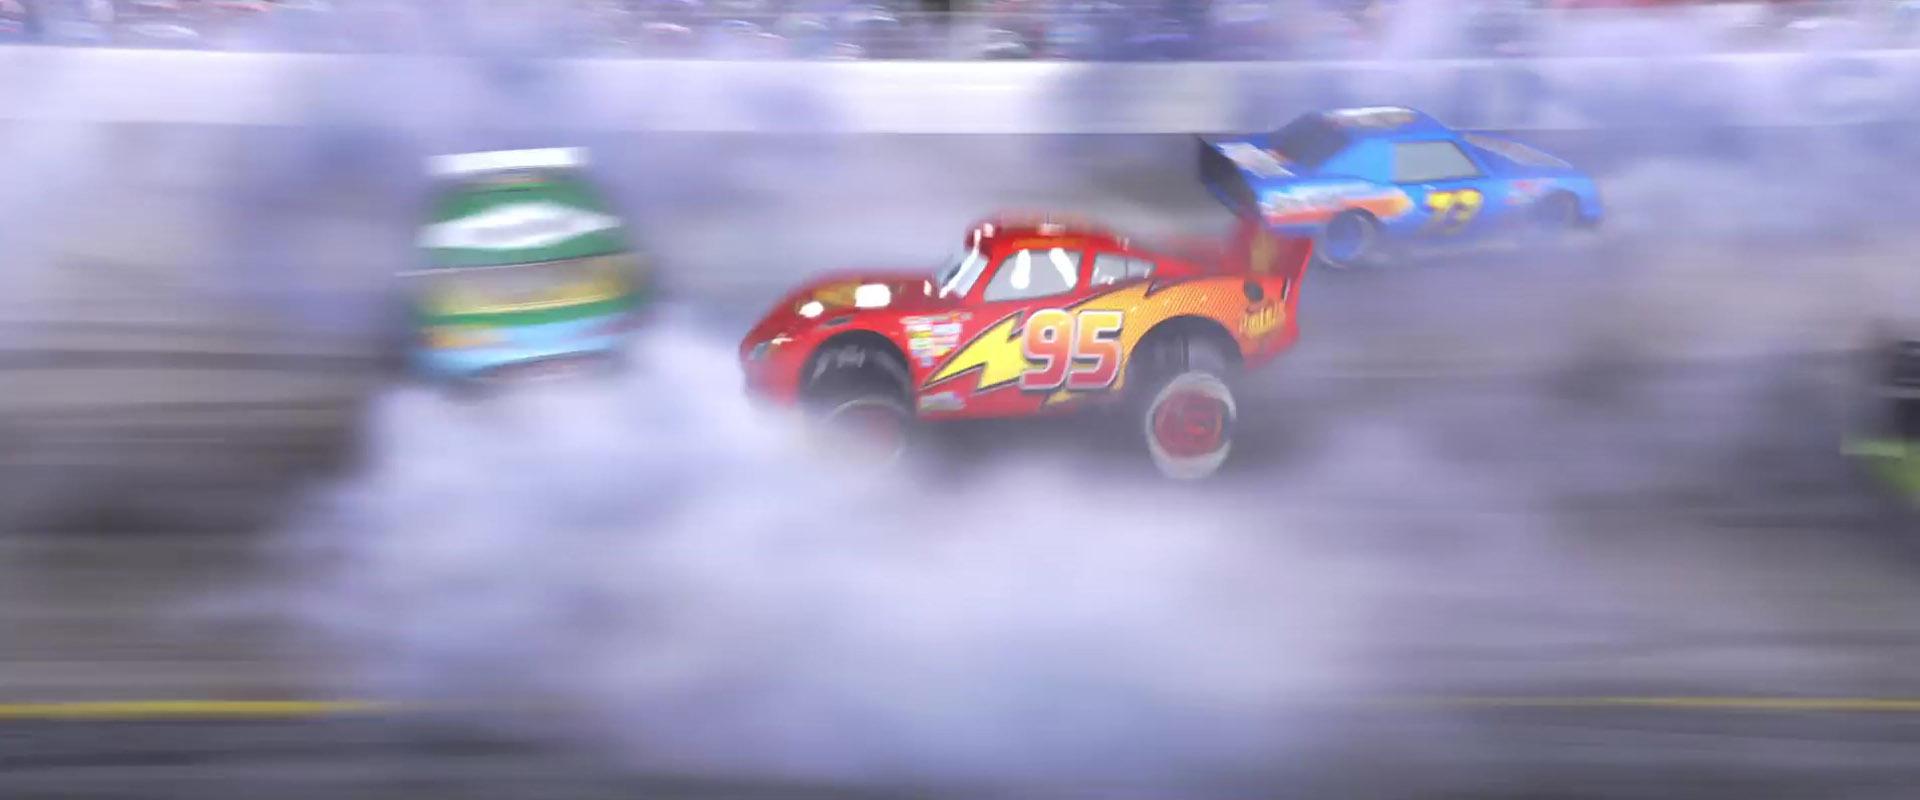 Misti Motorkrass Character From Cars Pixar Planet Fr